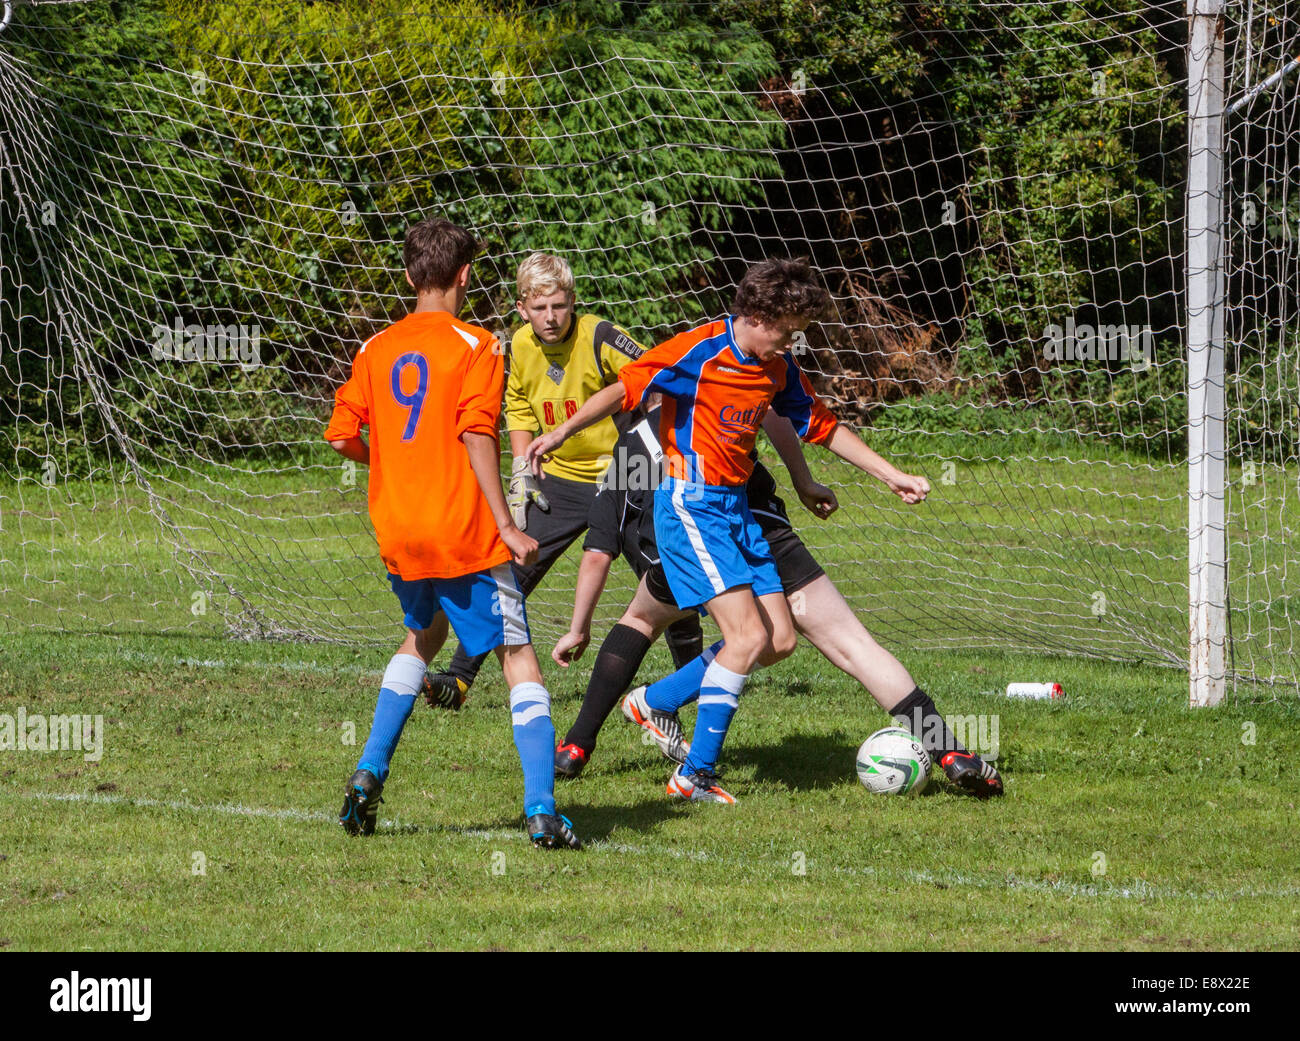 Schoolboy Football Match - Stock Image